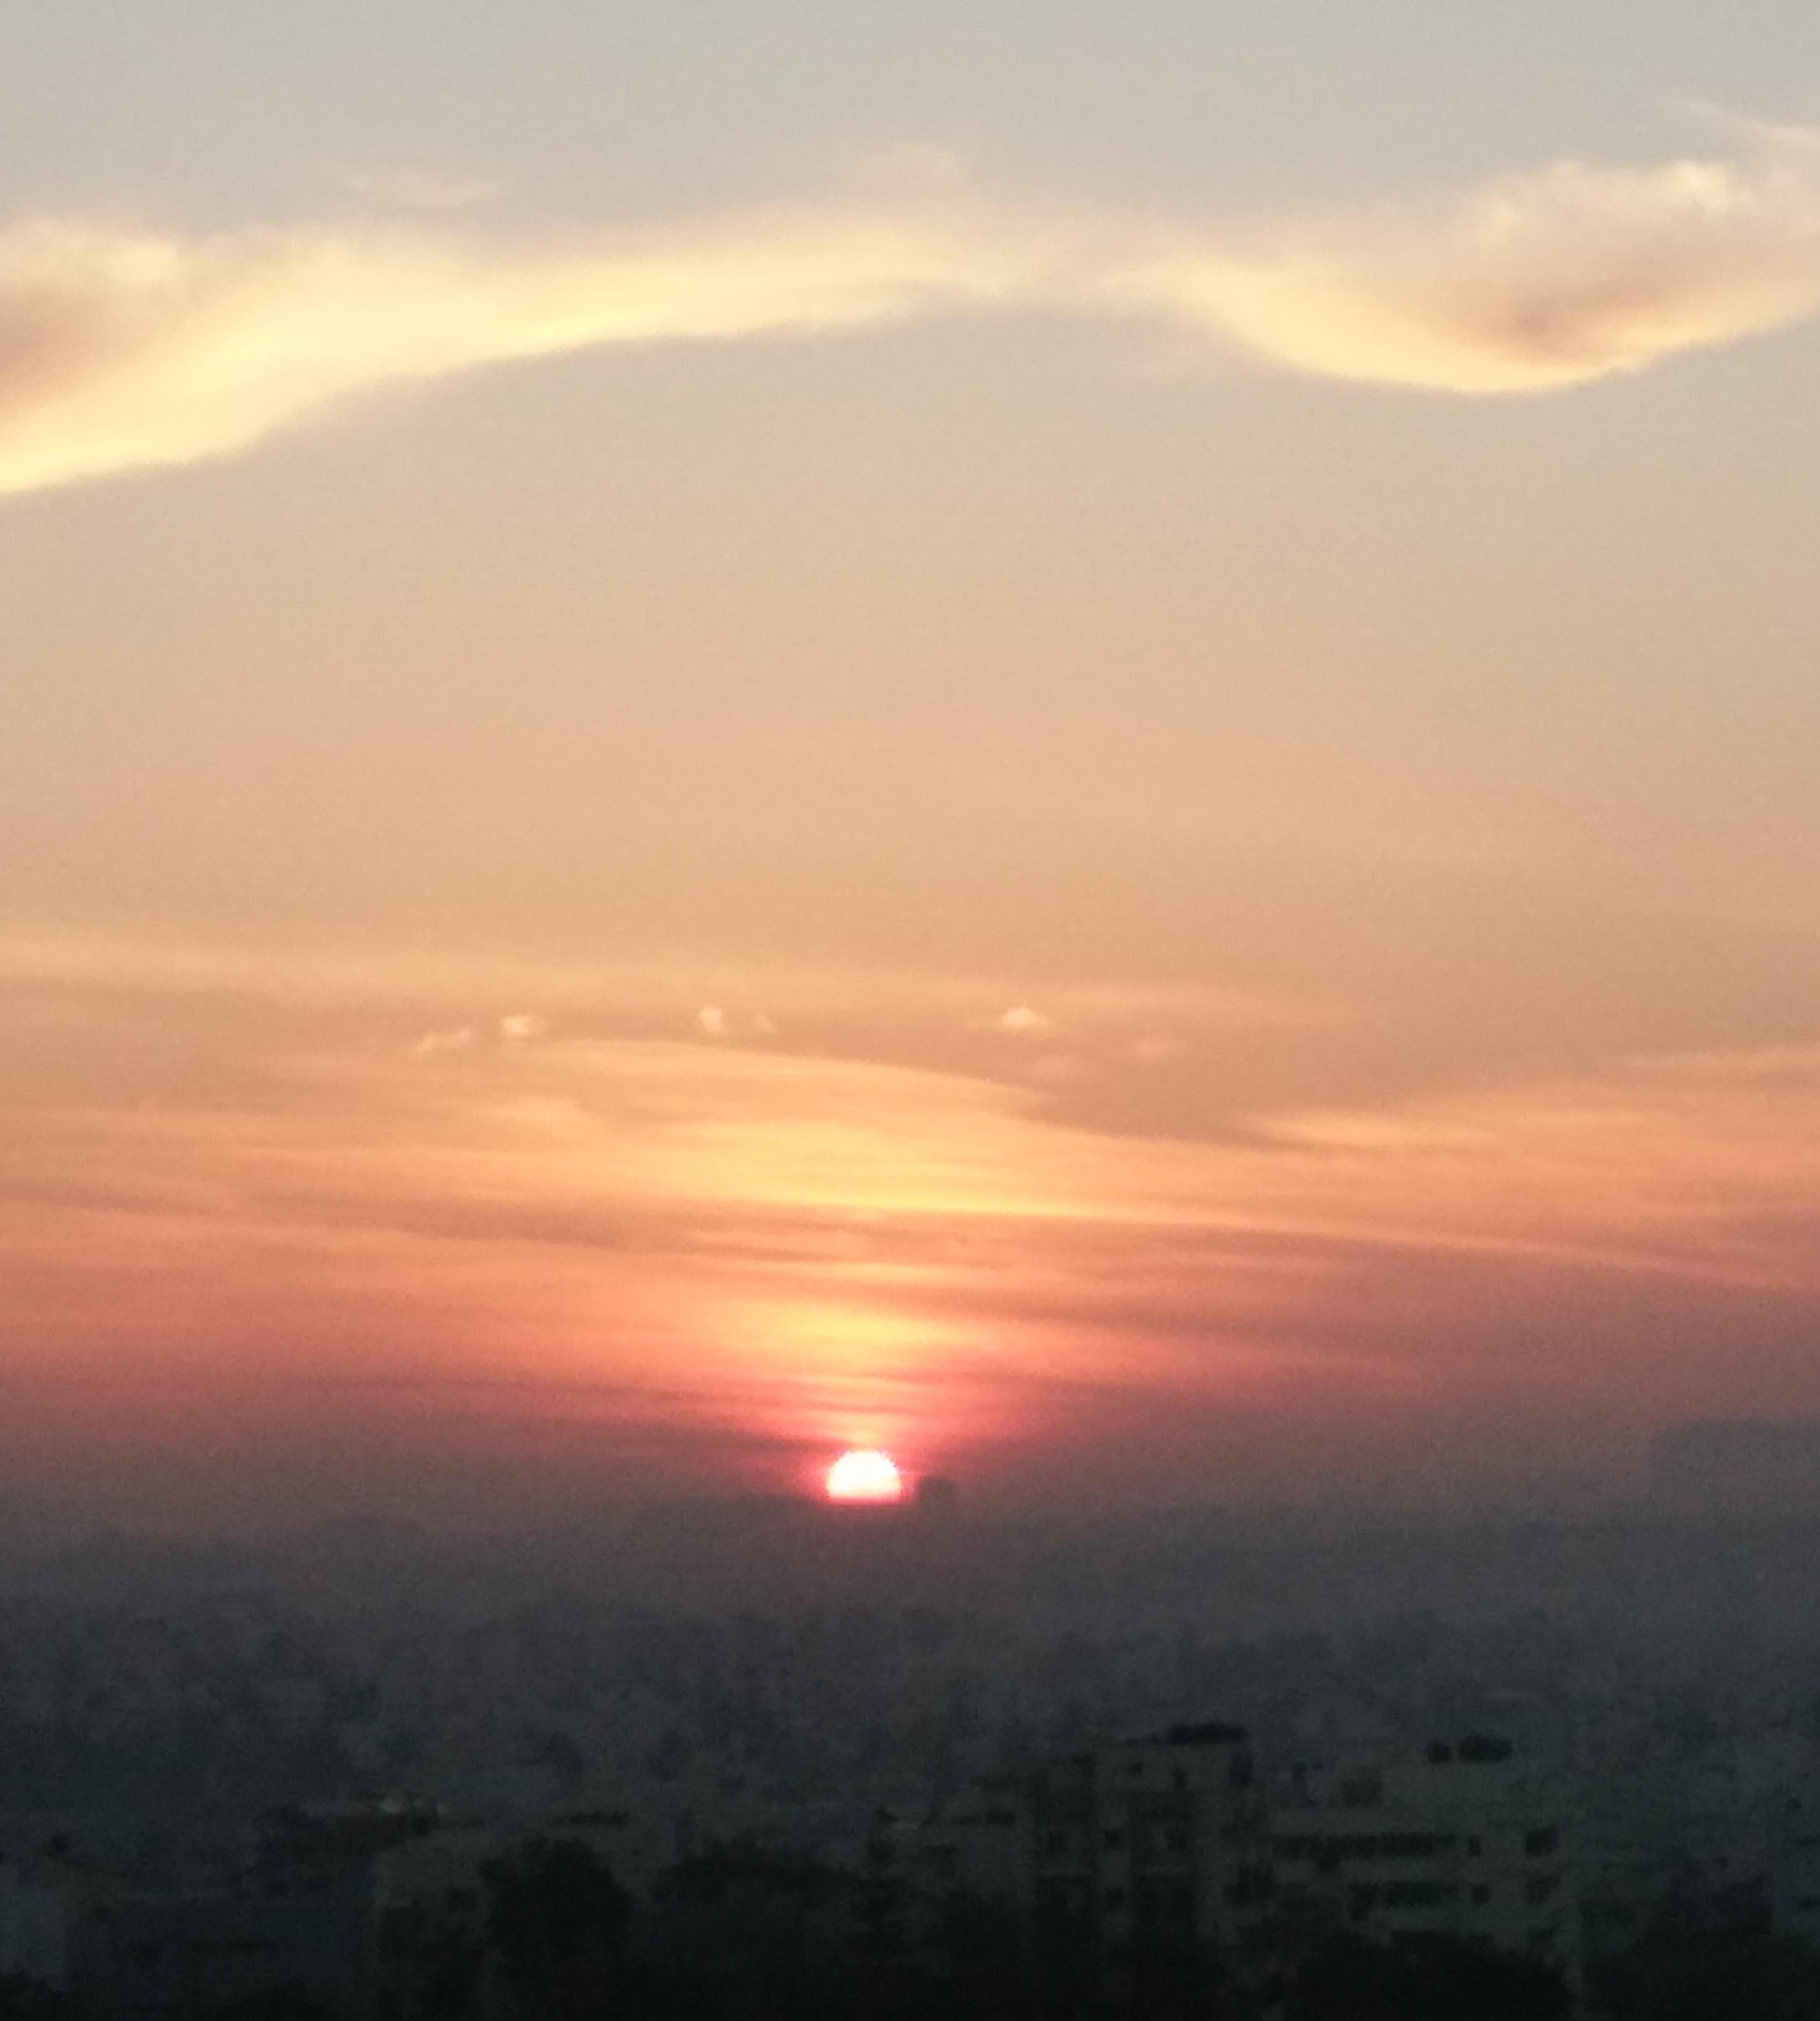 Sunrise over the city. photo